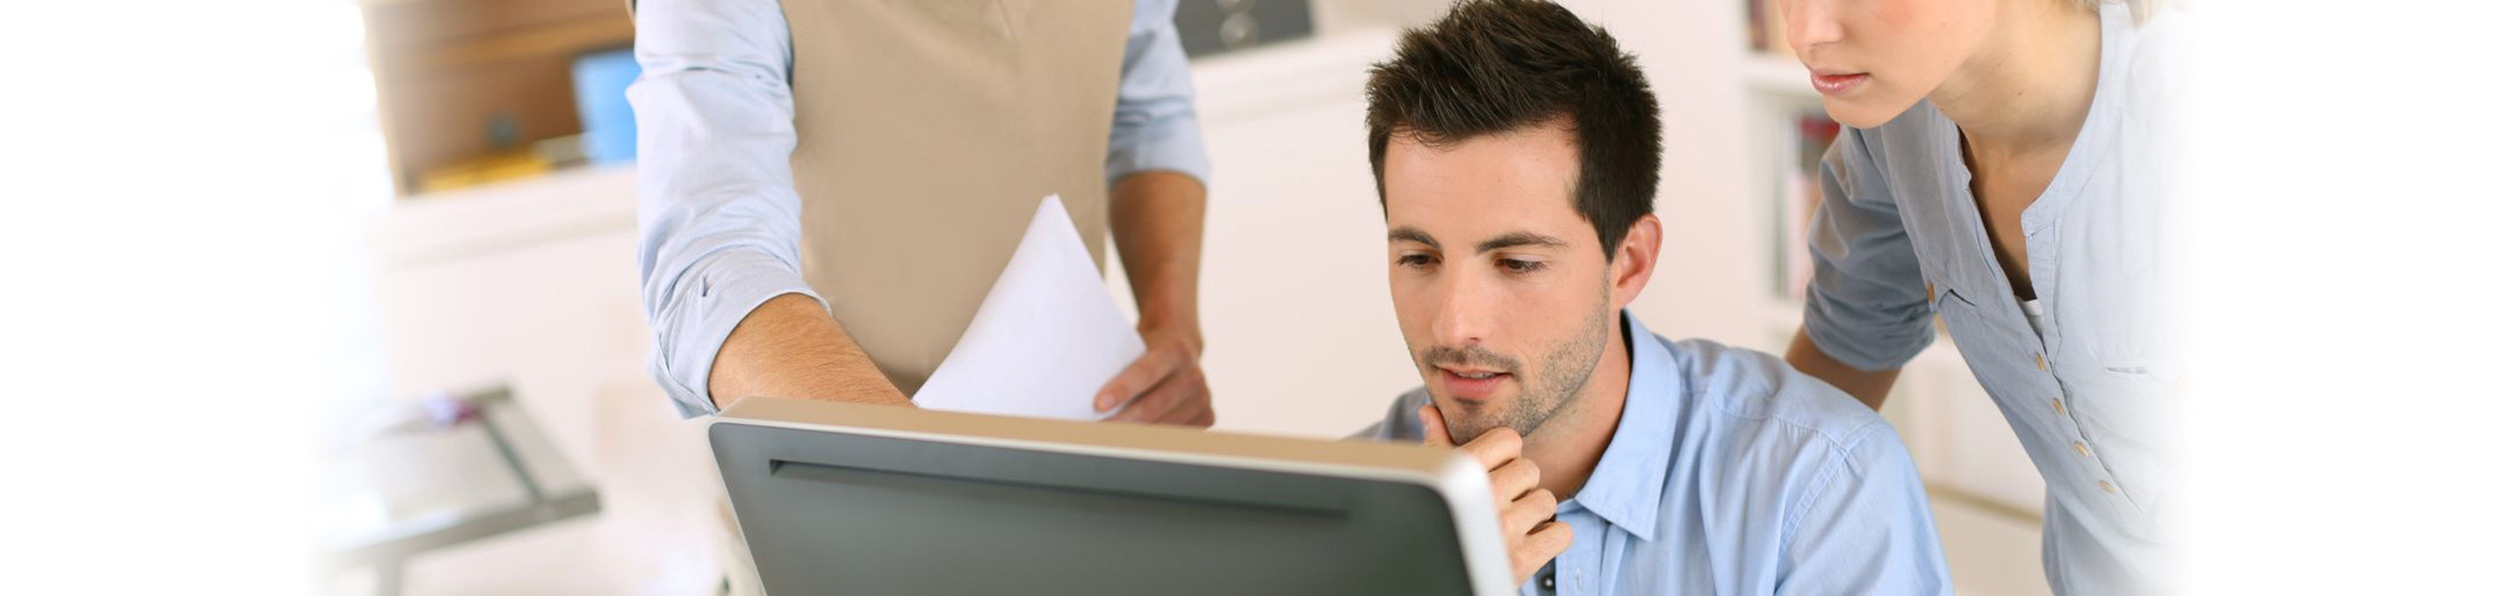 banner-employee-portal2.jpg